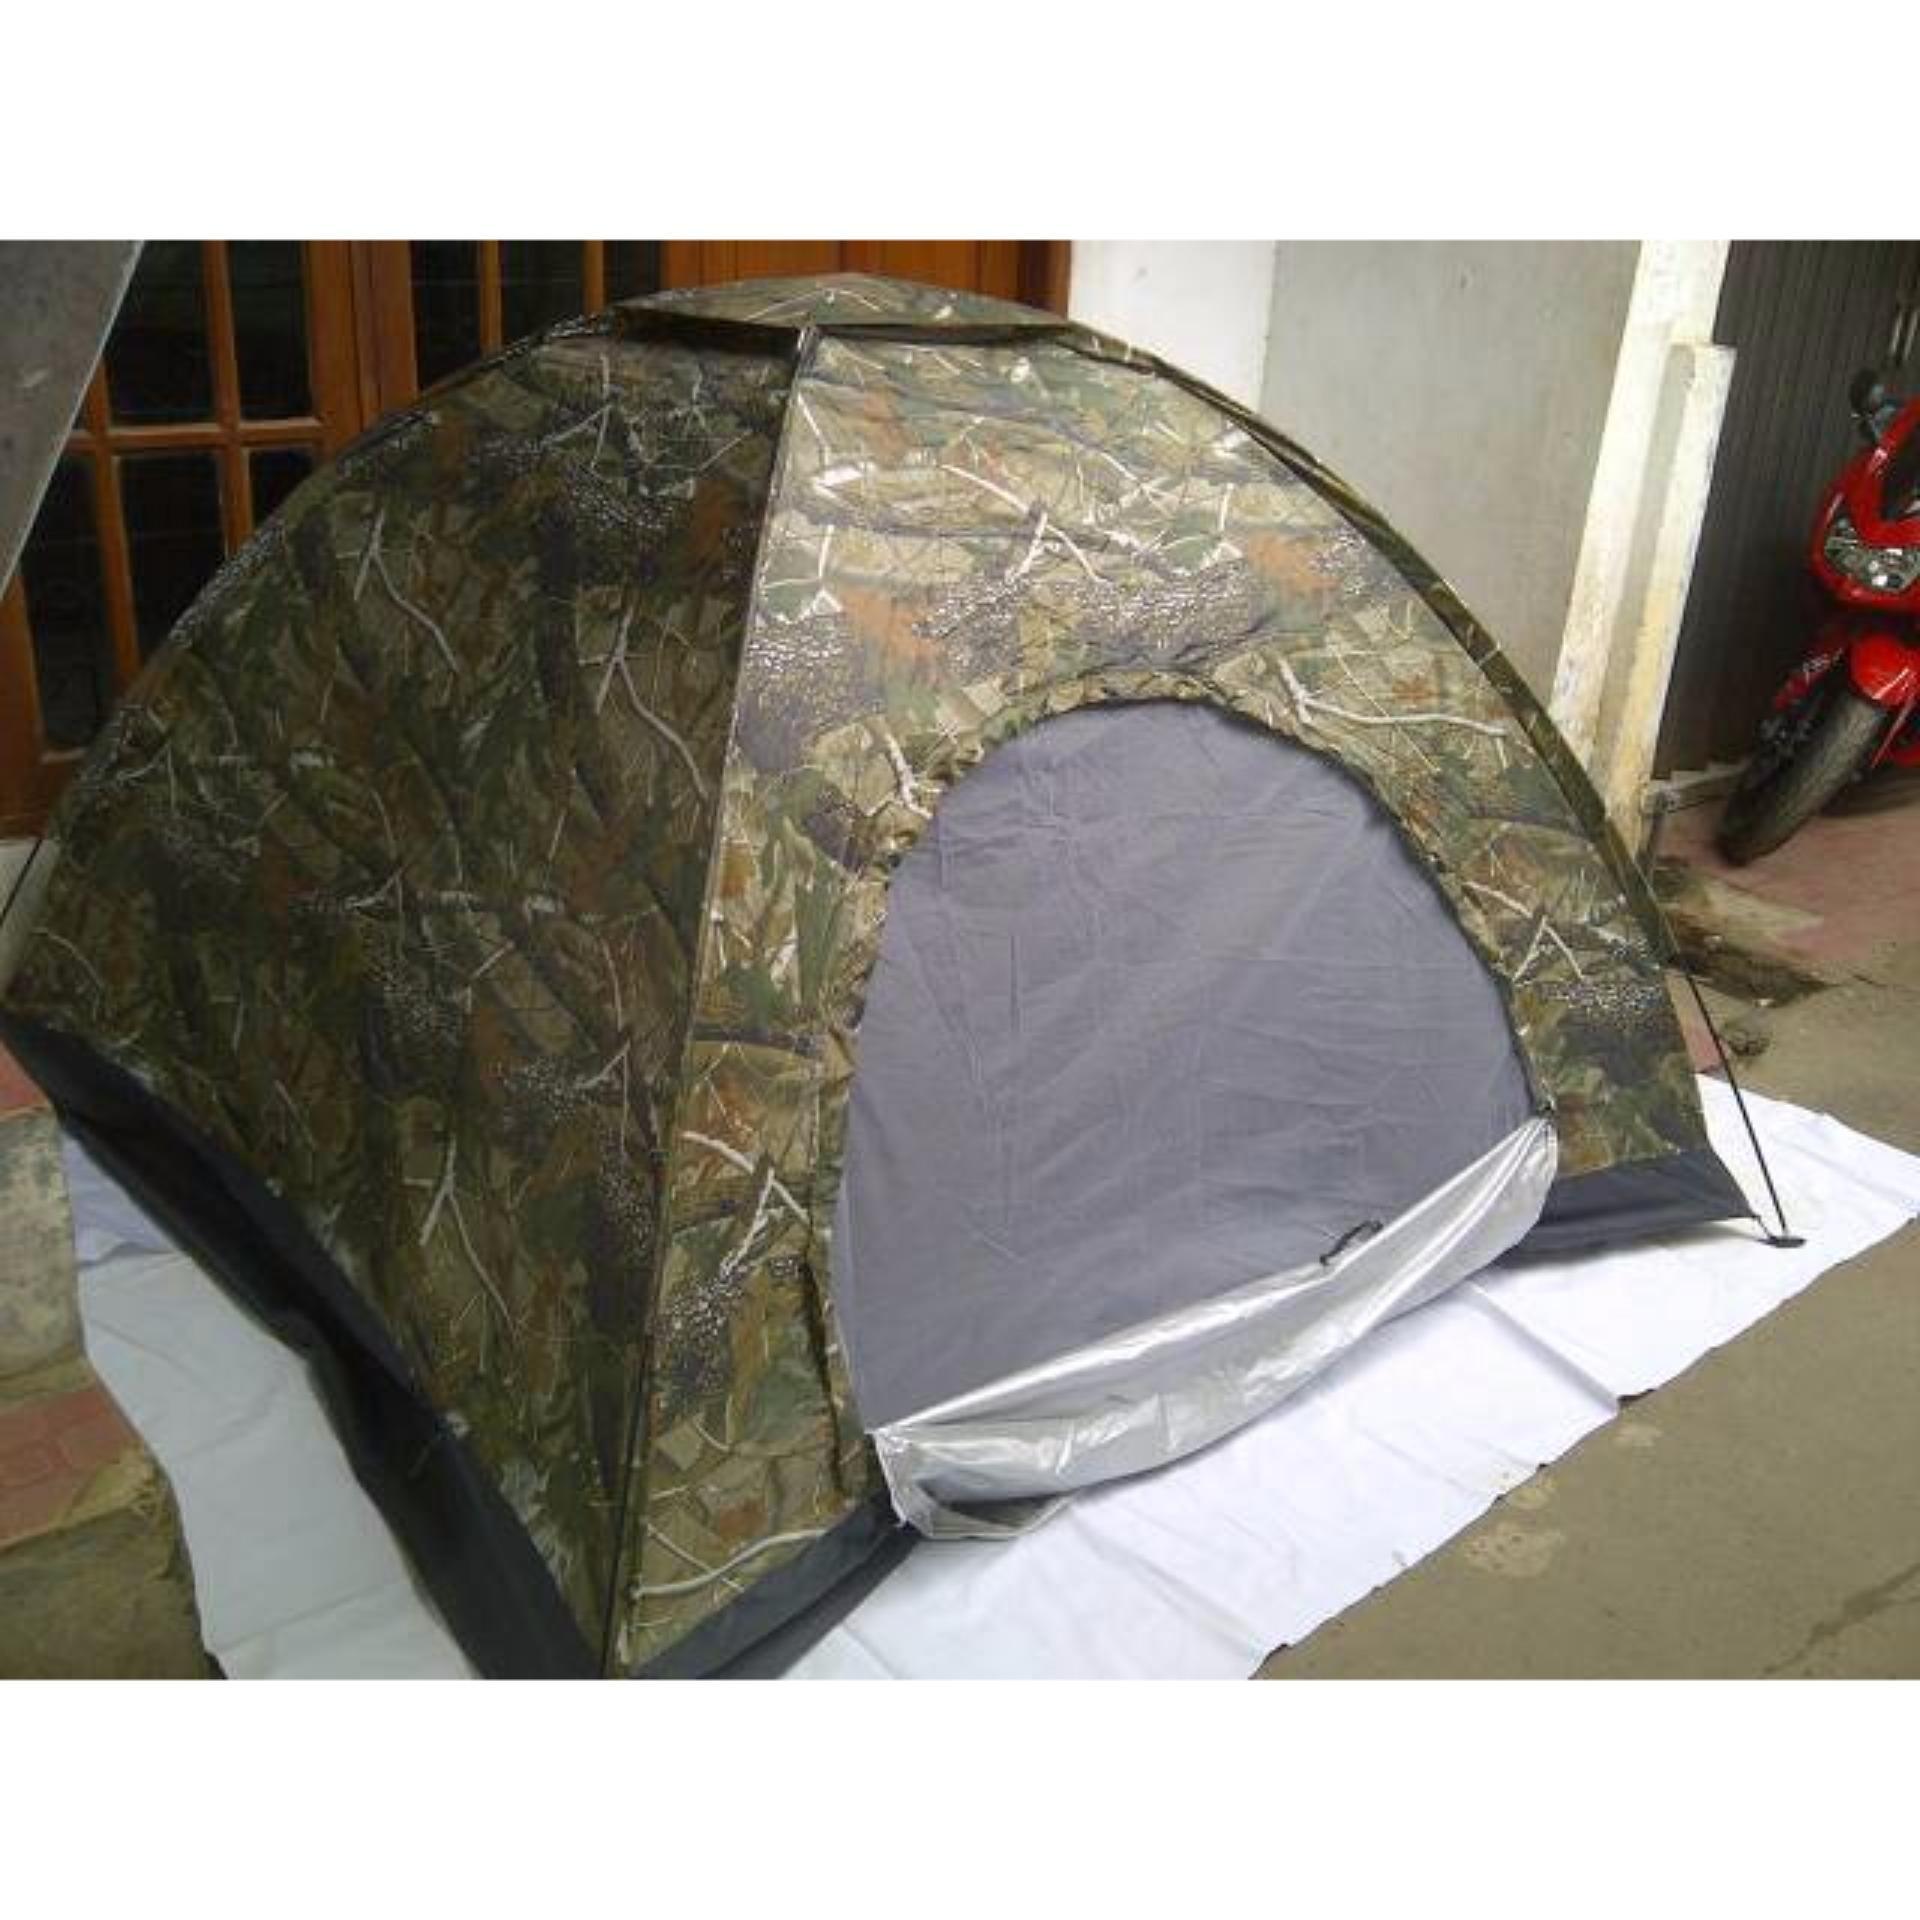 Belanja Murah Promosi Tenda Dome Kapasitas 4 5 Orang Warna Loreng 6 Ultralightmurah